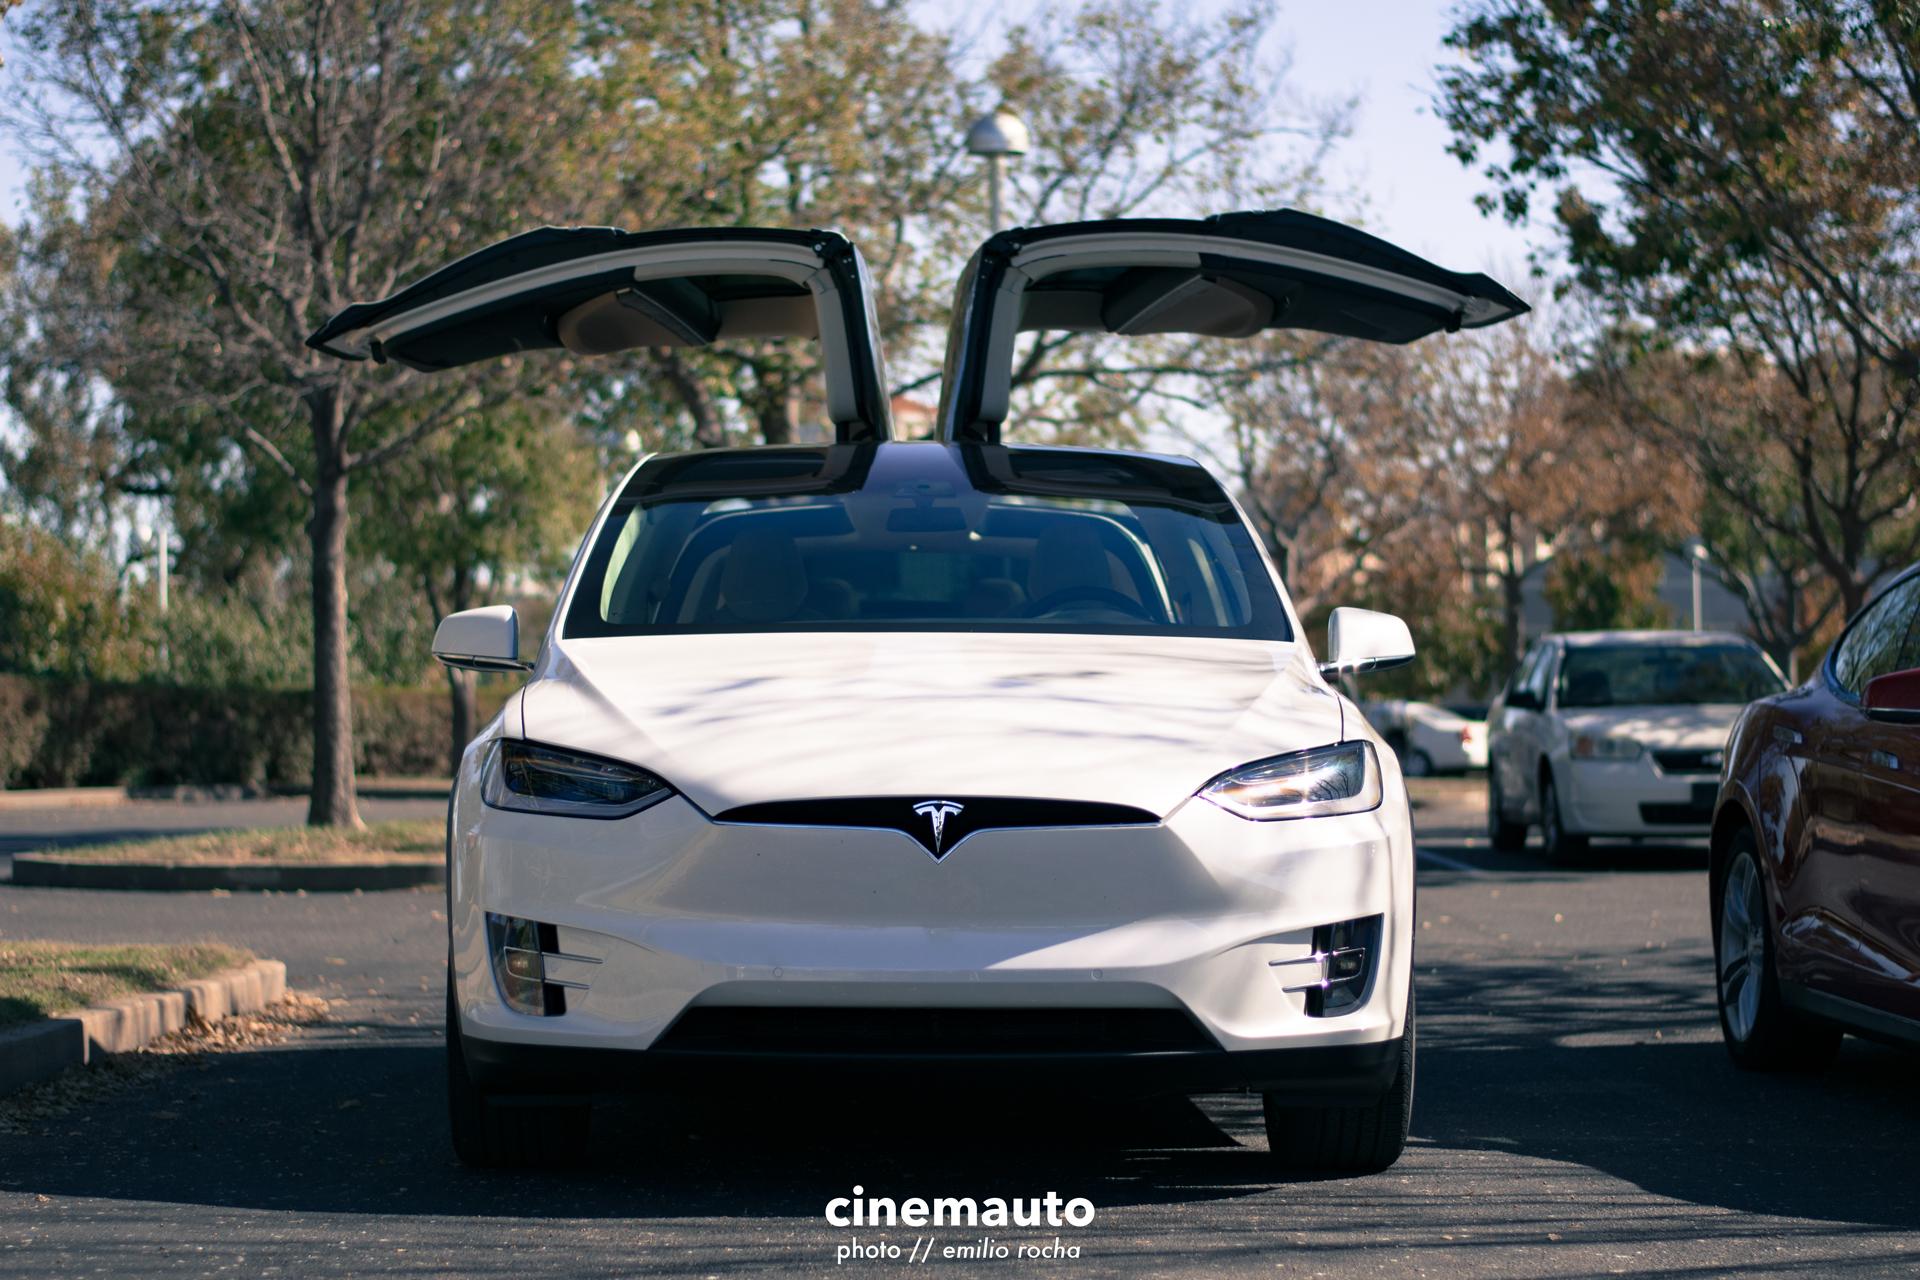 TeslaCinemauto-10.jpg